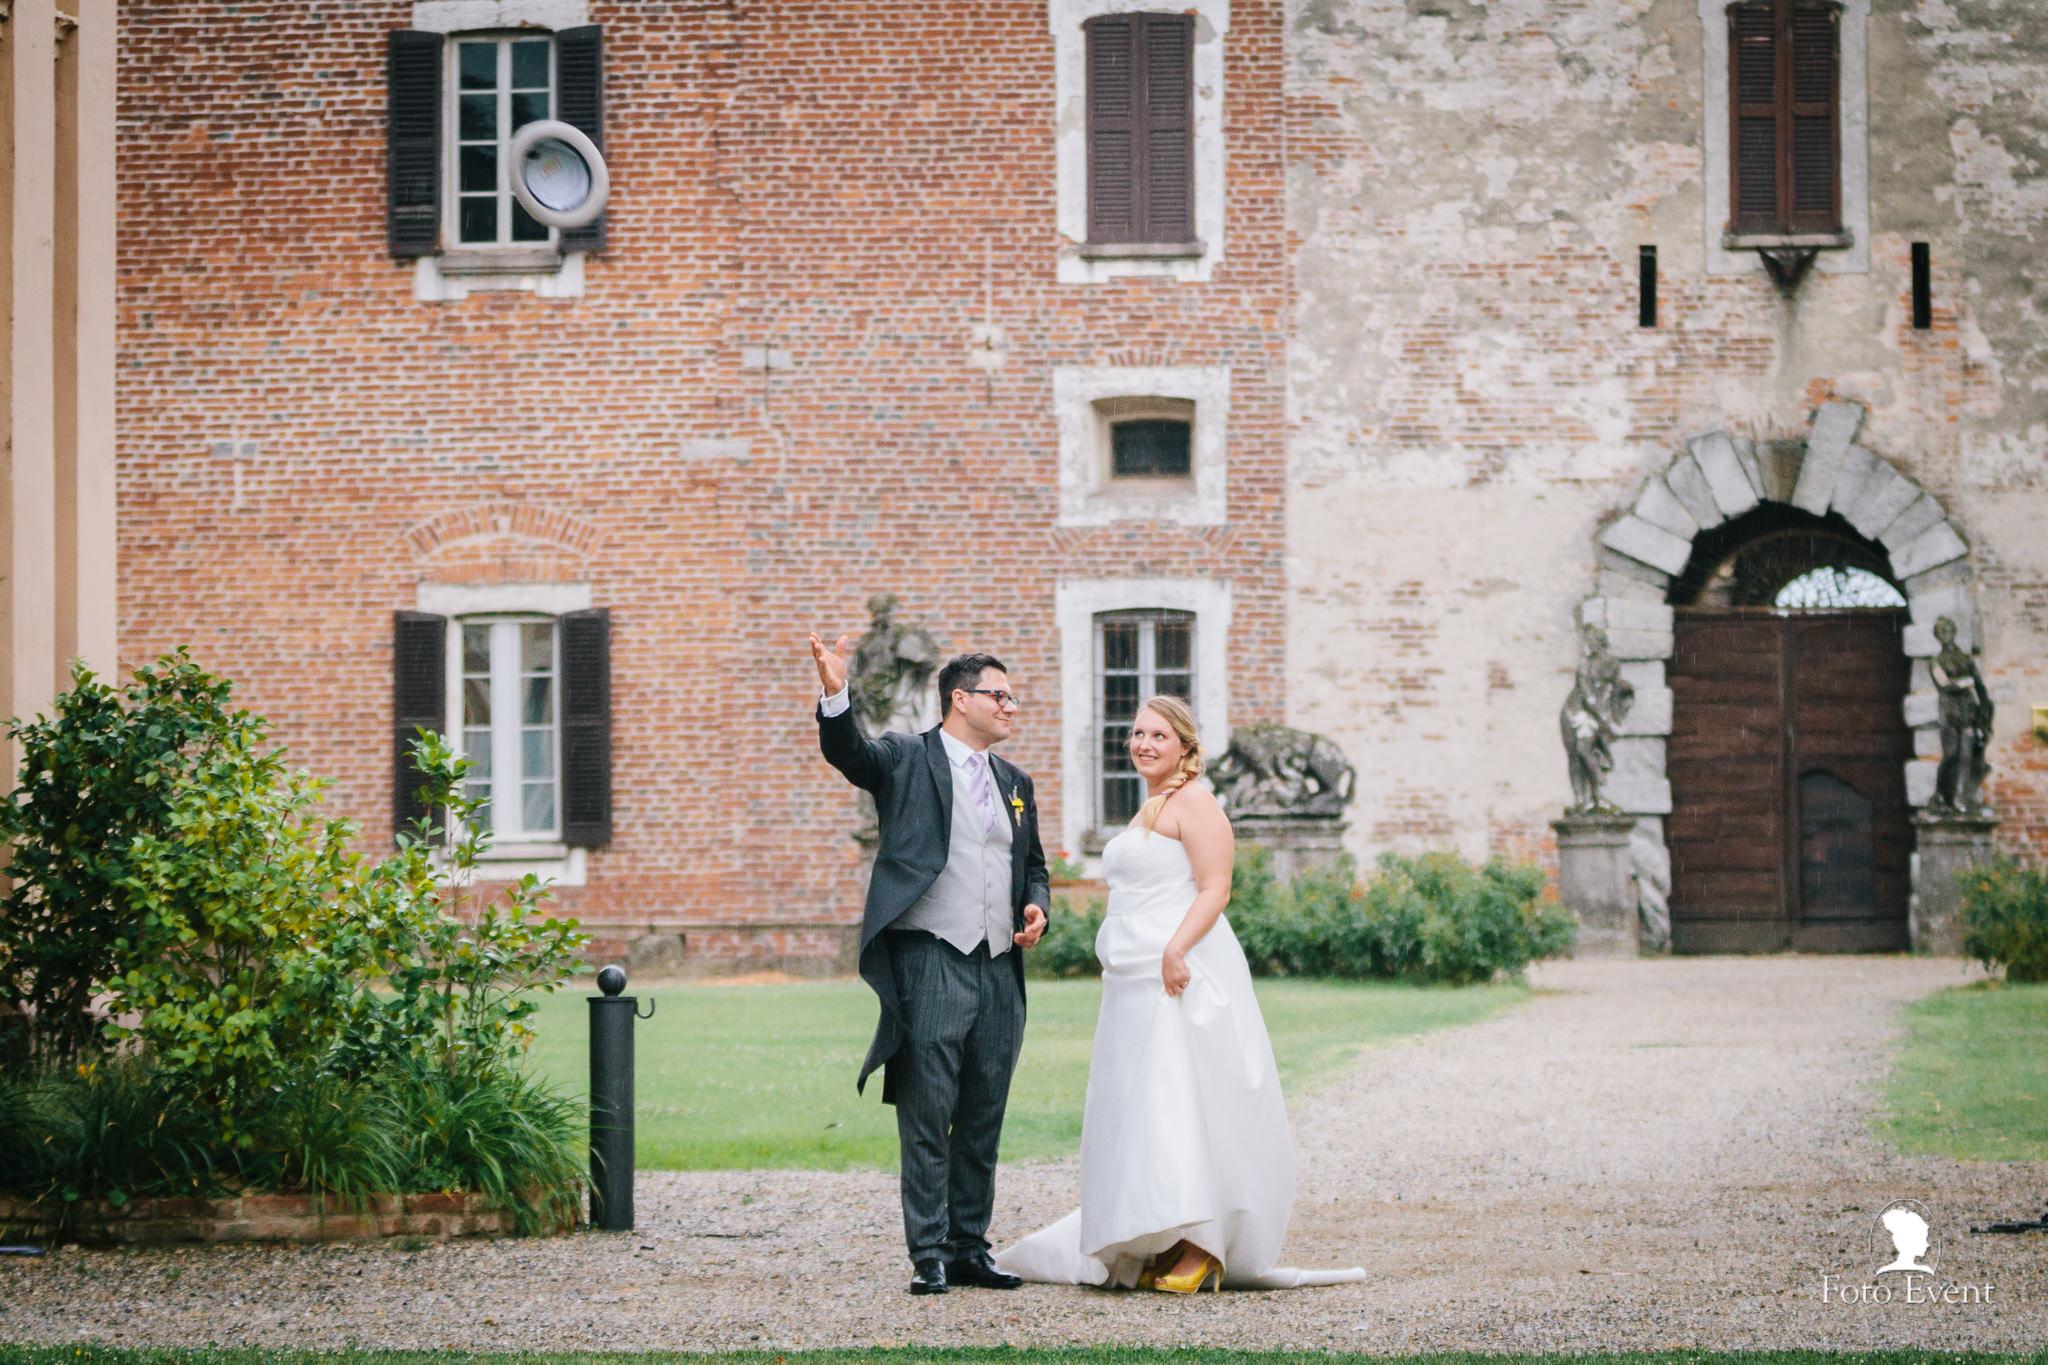 067-2019-07-27-Matrimonio-Valentina-e-Alessandro-Pettinari-zoom-584